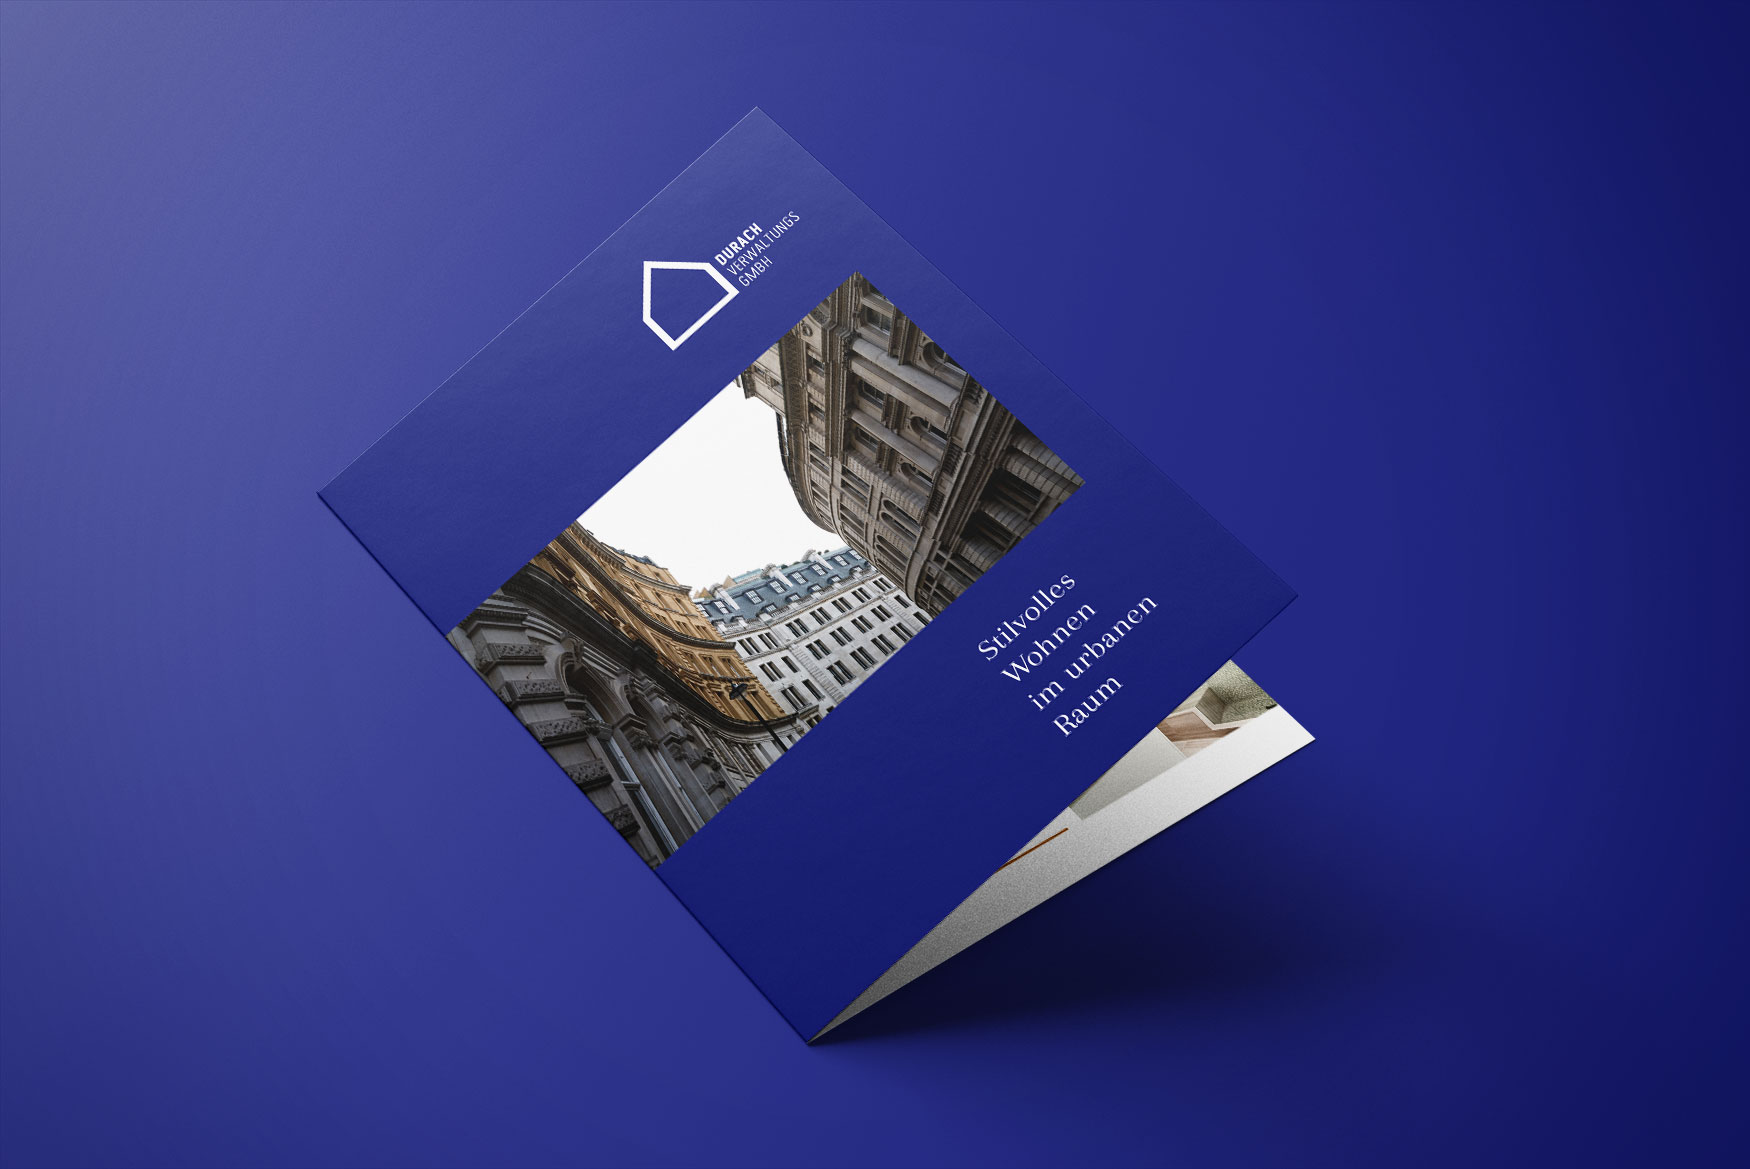 Exposee-Design-Immobilien-1-Designagentur-Stuttgart-Kreativbetrieb